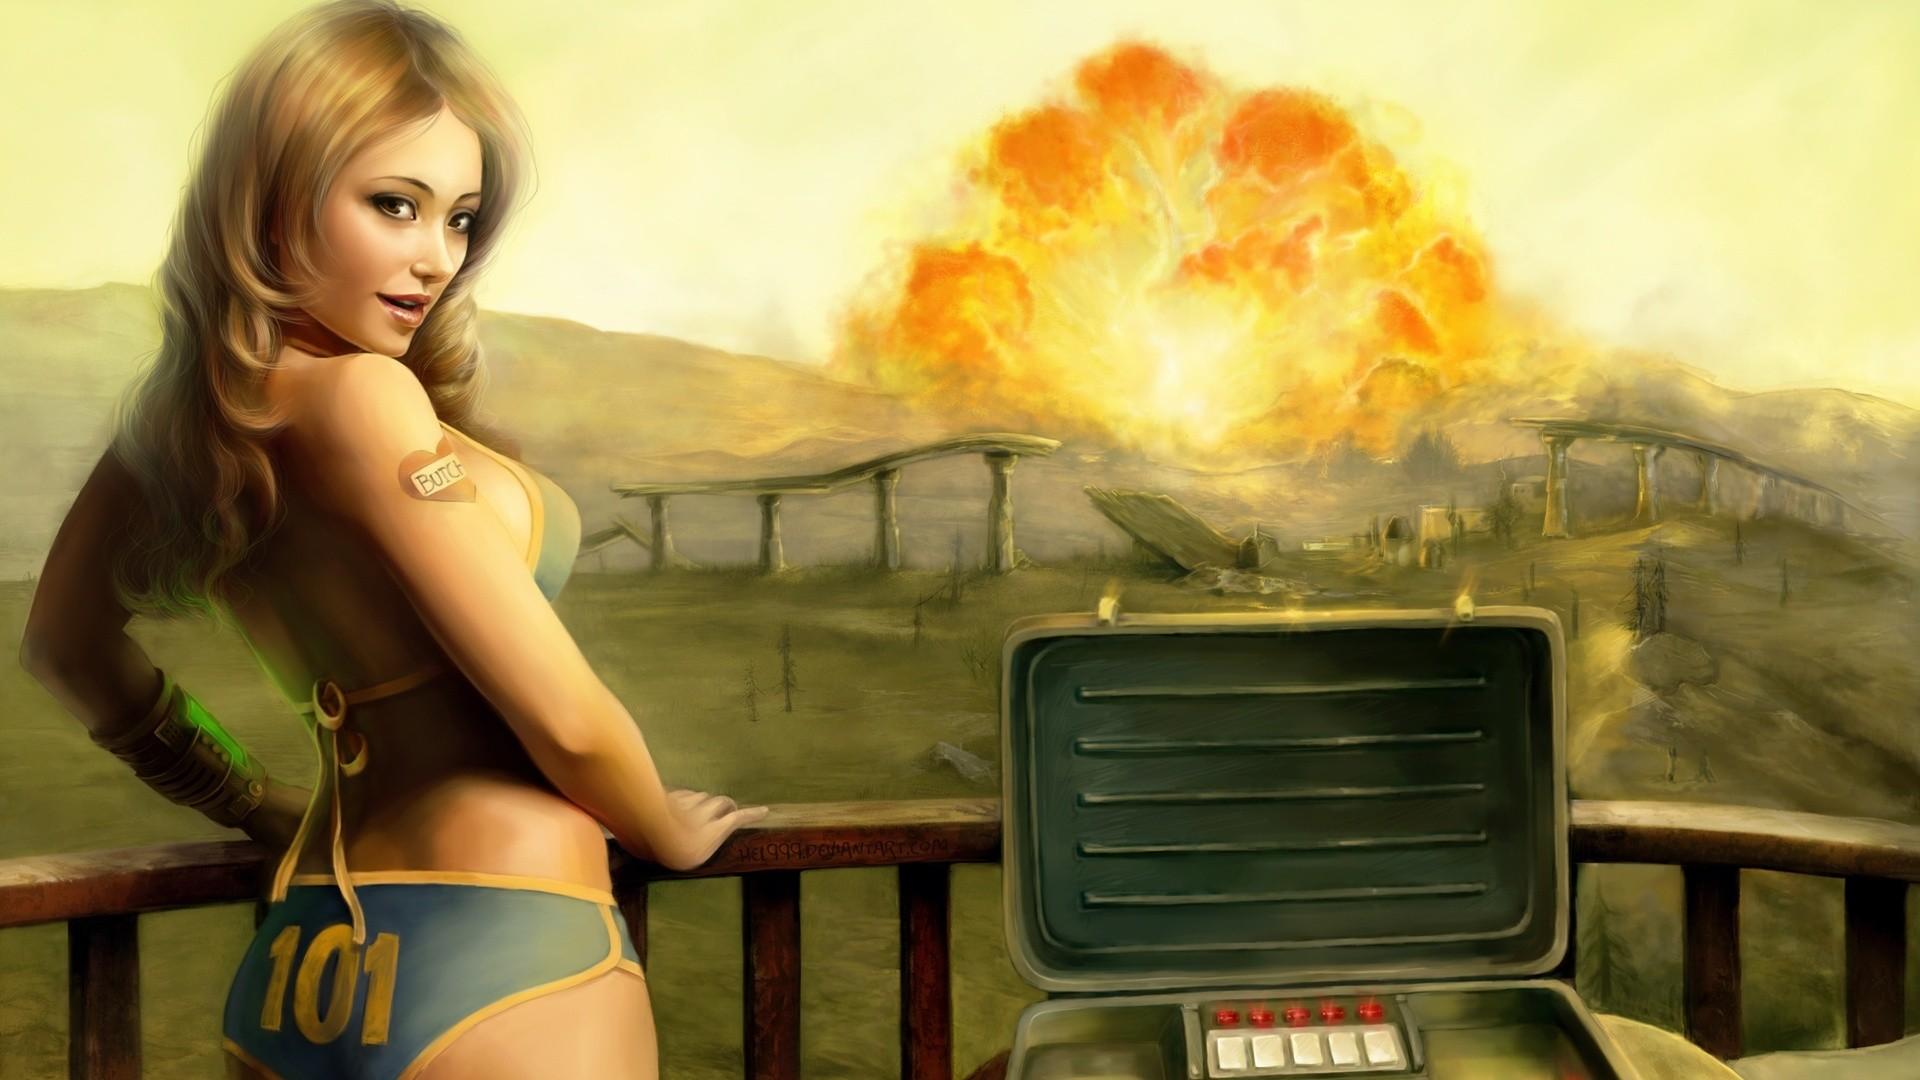 Fallout 4 Power Armor Wallpaper HD – Jimaintl.com